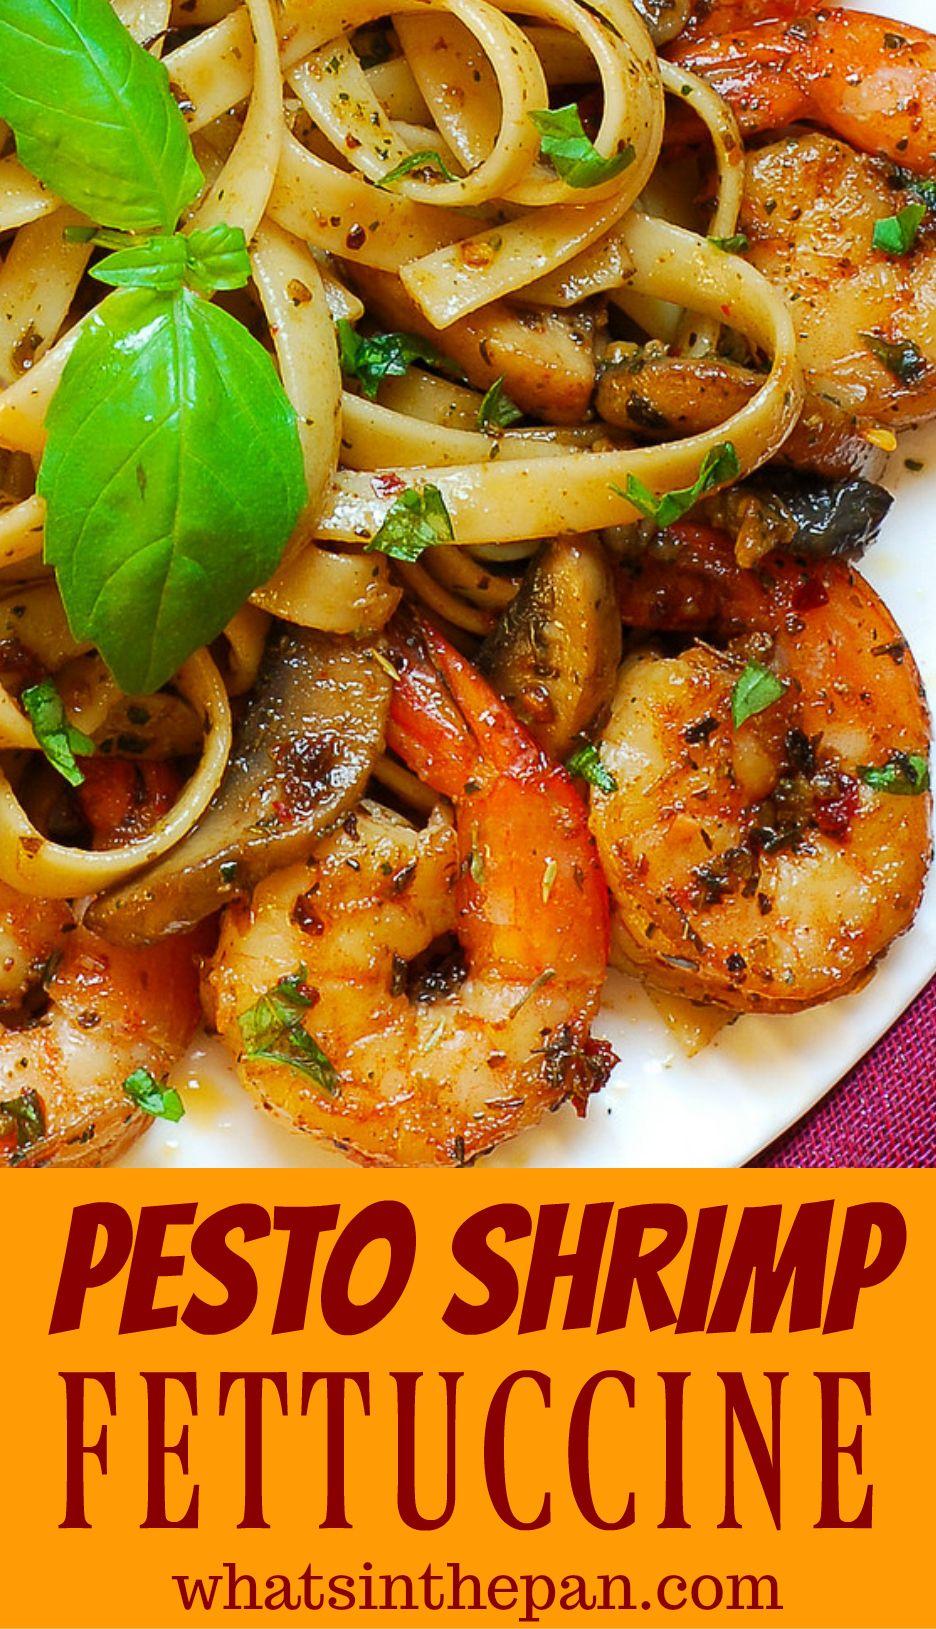 Pesto Shrimp Fettuccine #shrimpfettuccine